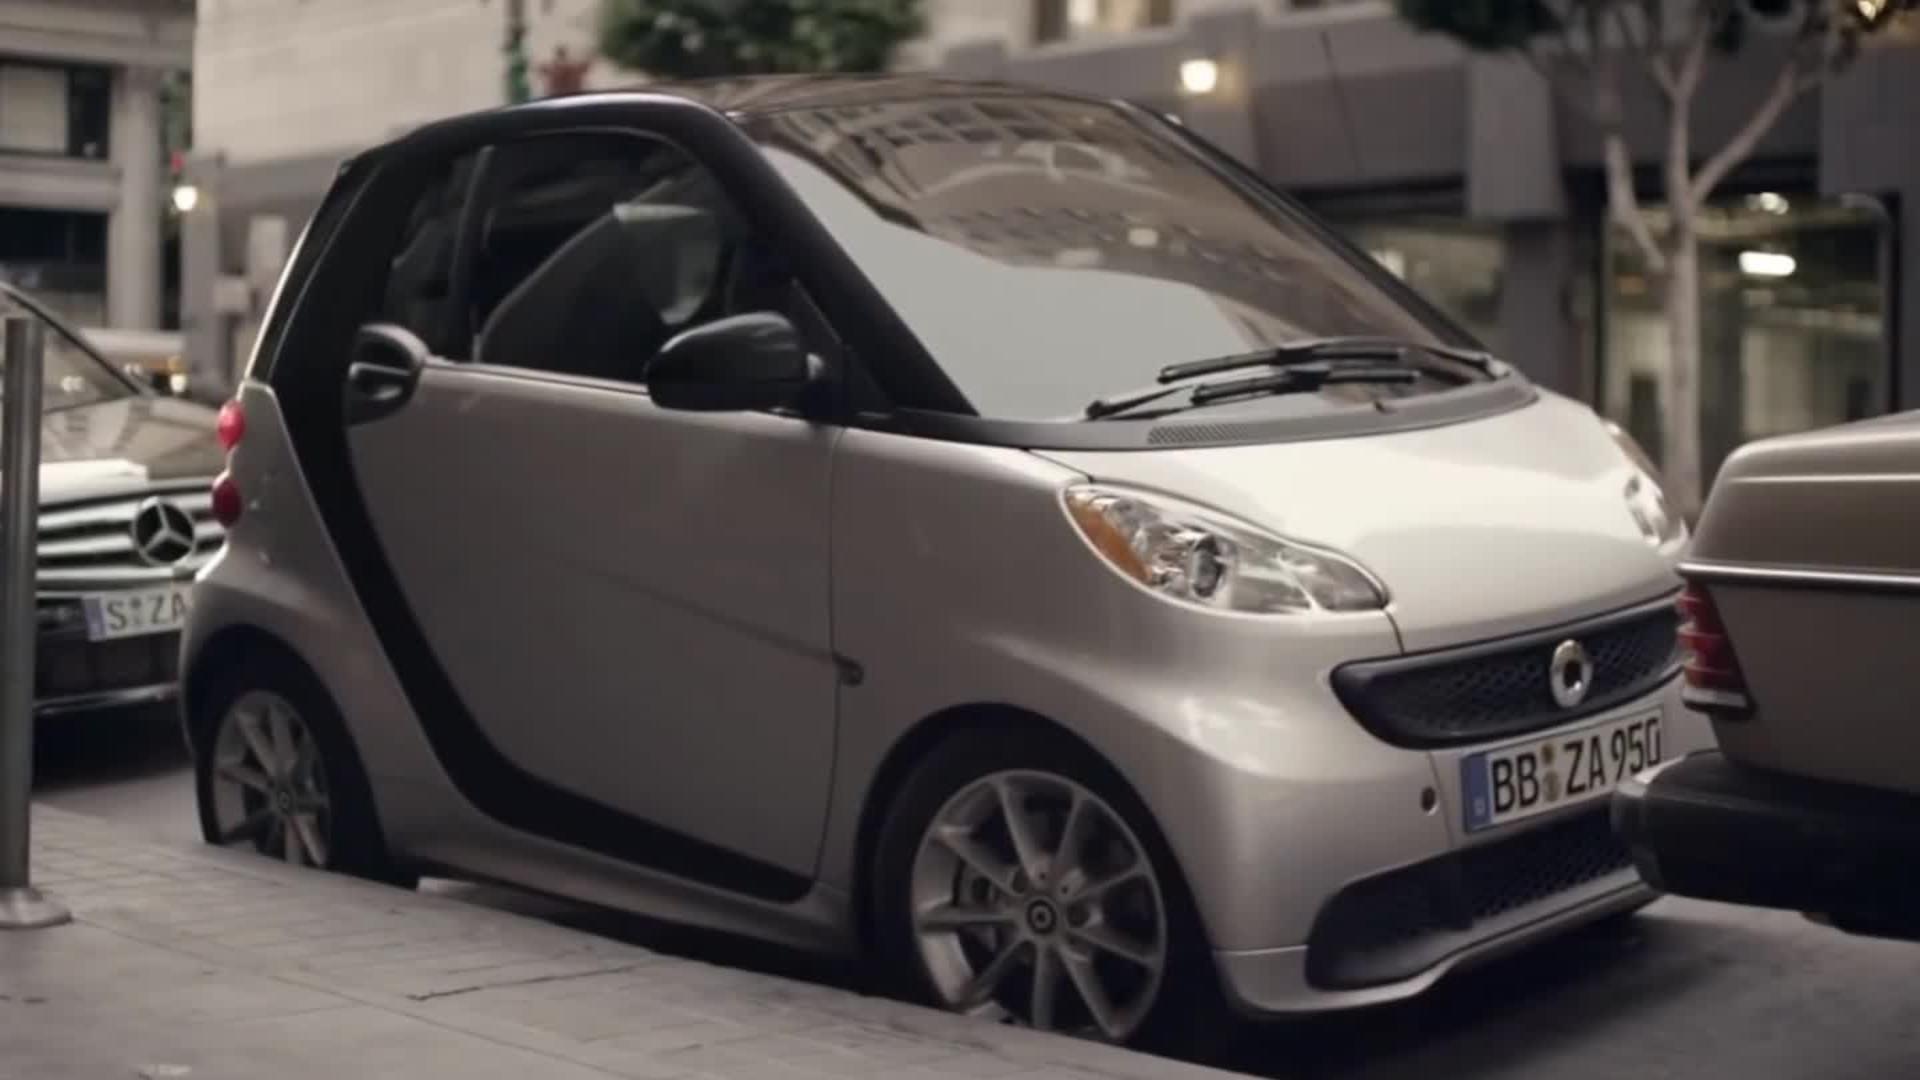 Best Car Commercials 2020 10 of the world's best car commercials   CNN Video